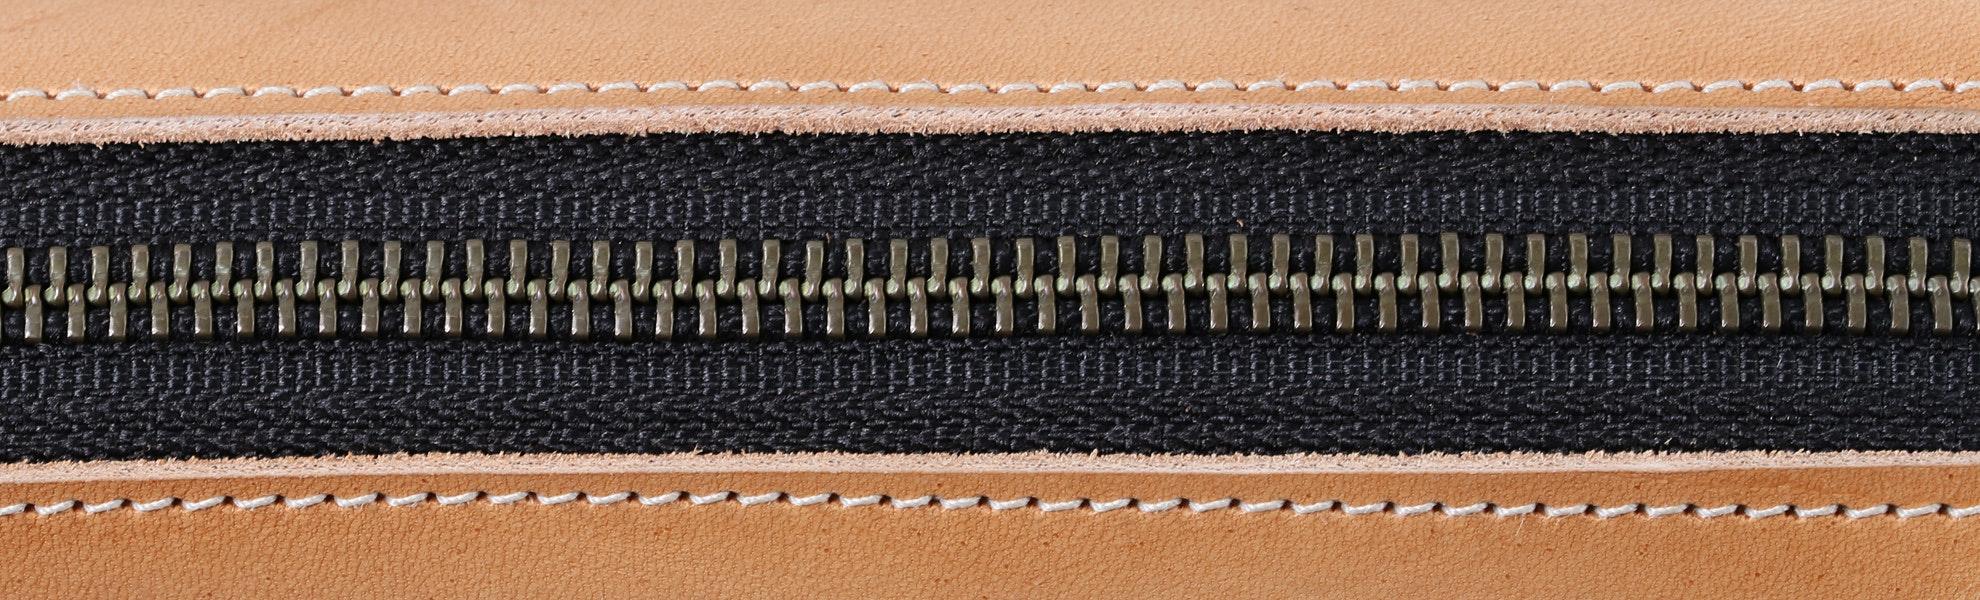 Ferdinand's Leather Pencil Case